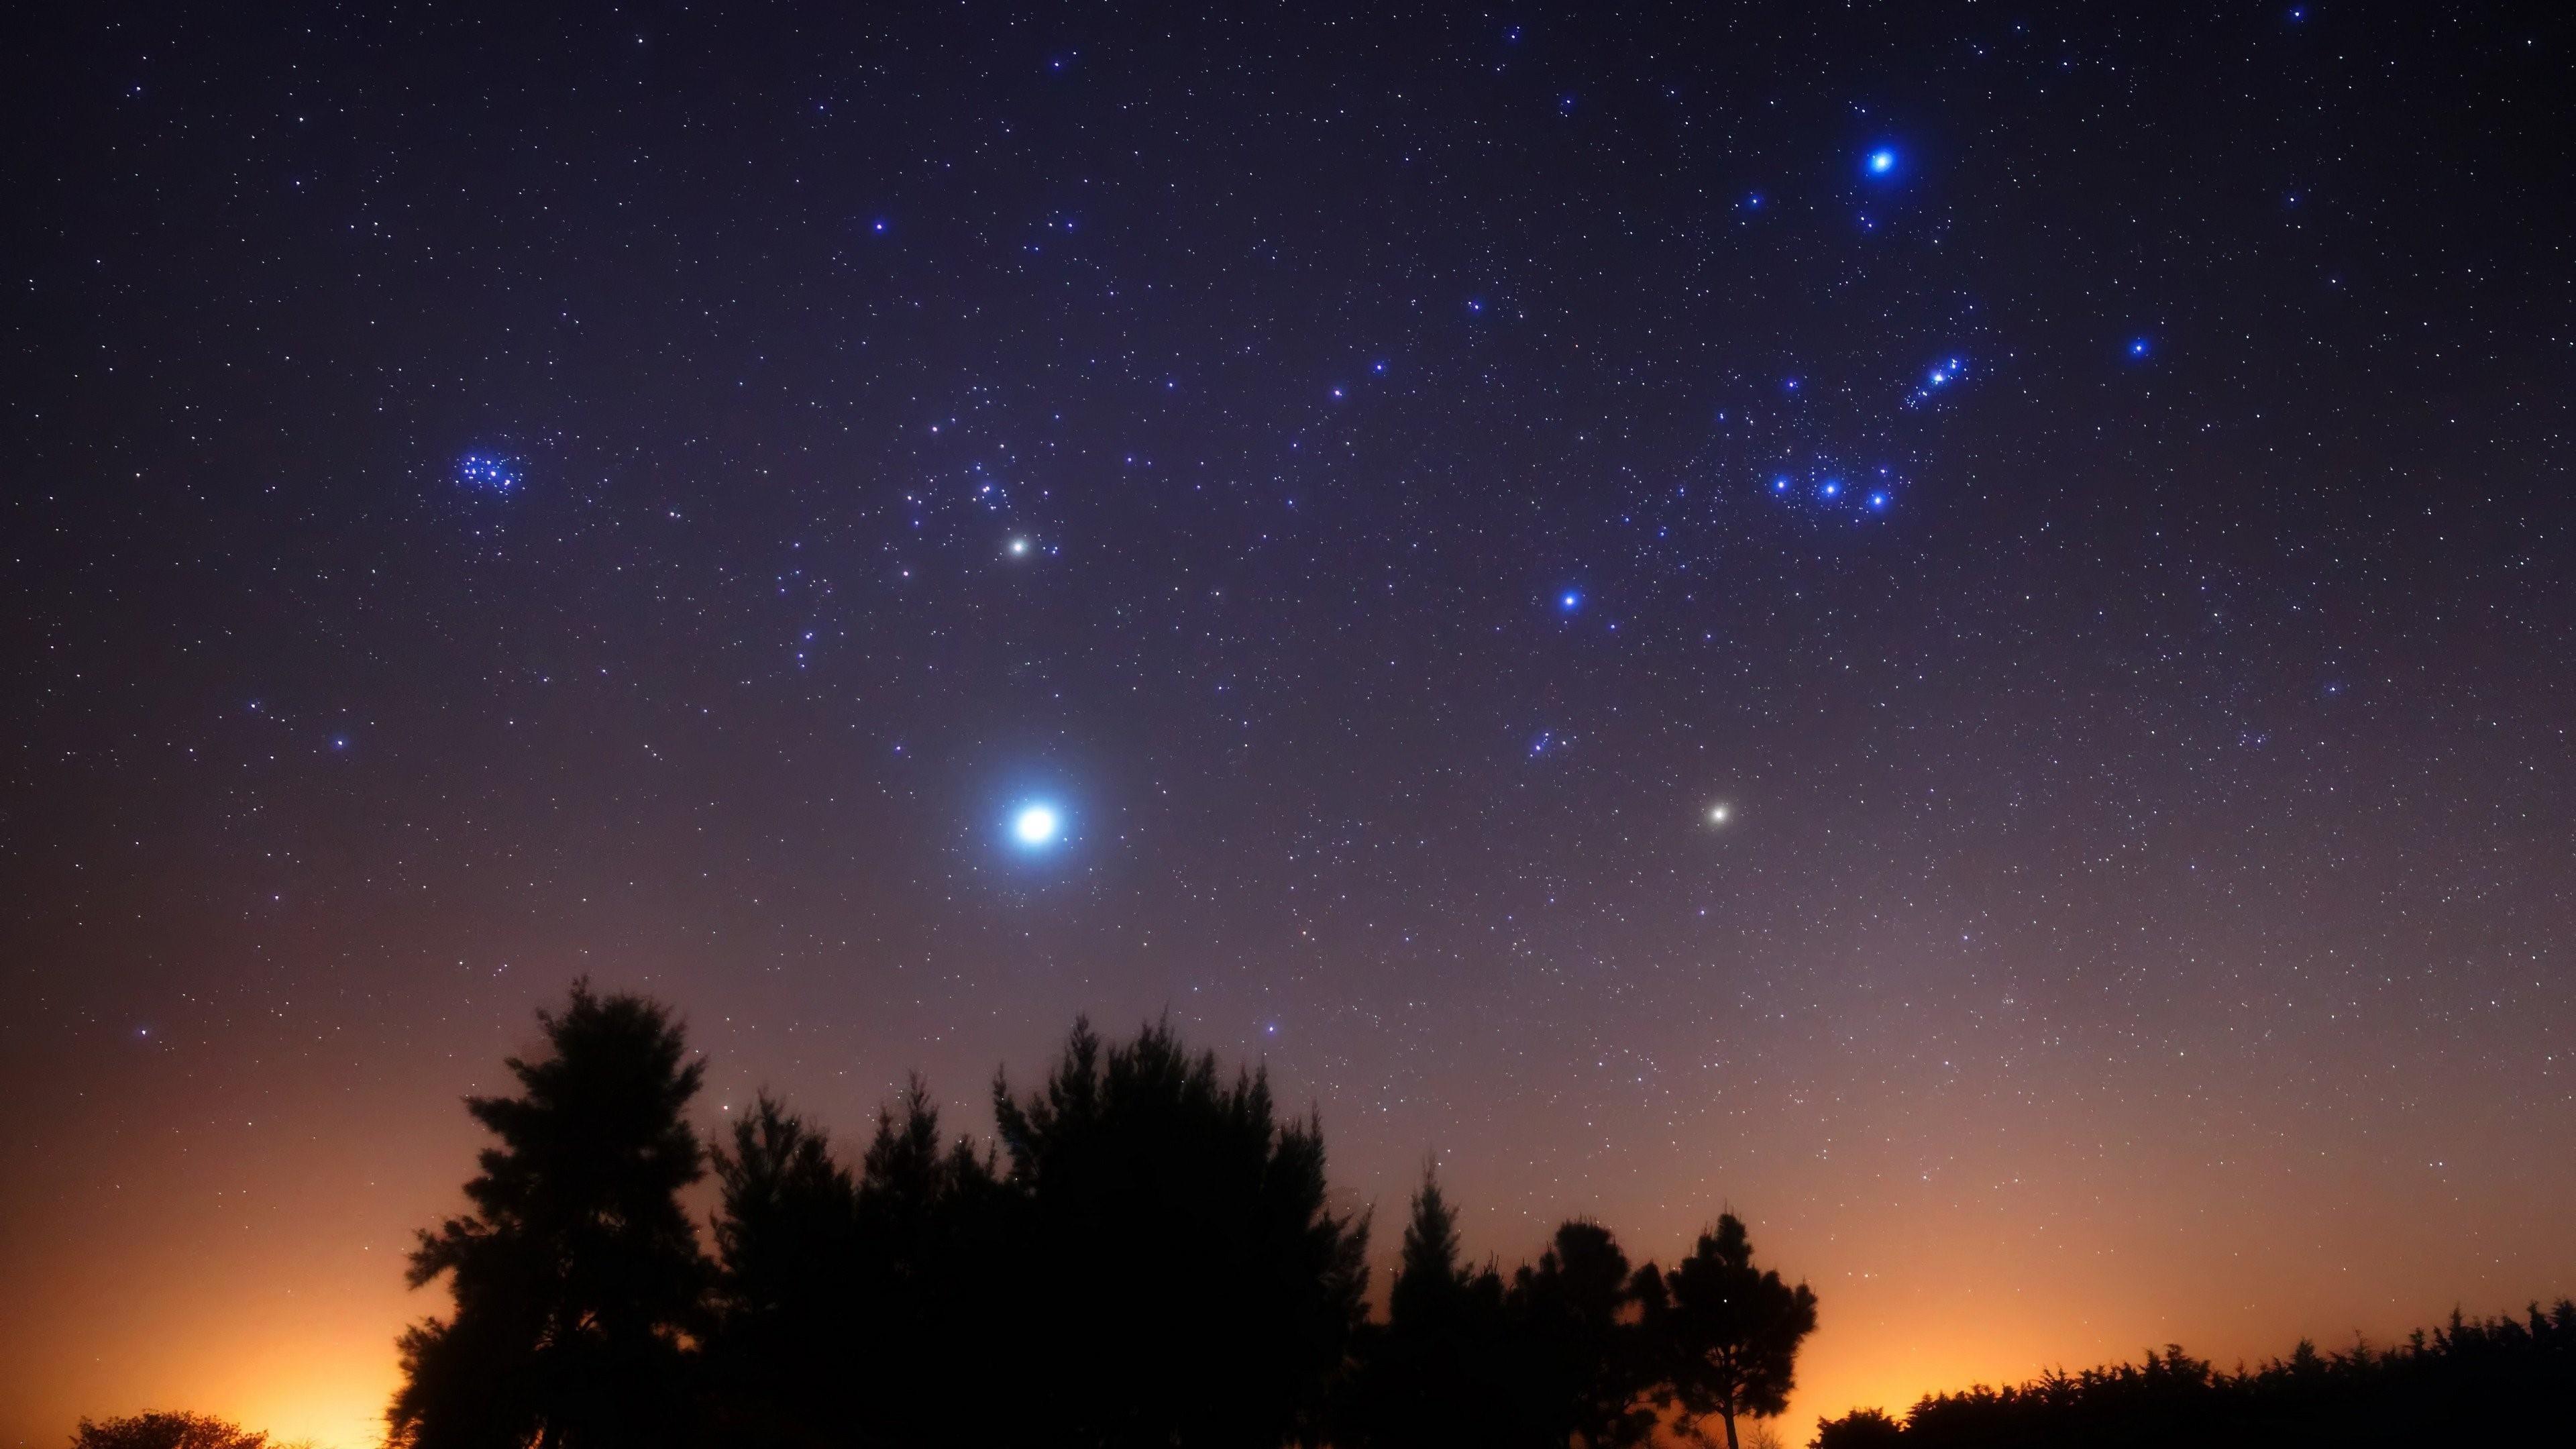 Title. Stars shining on the night sky